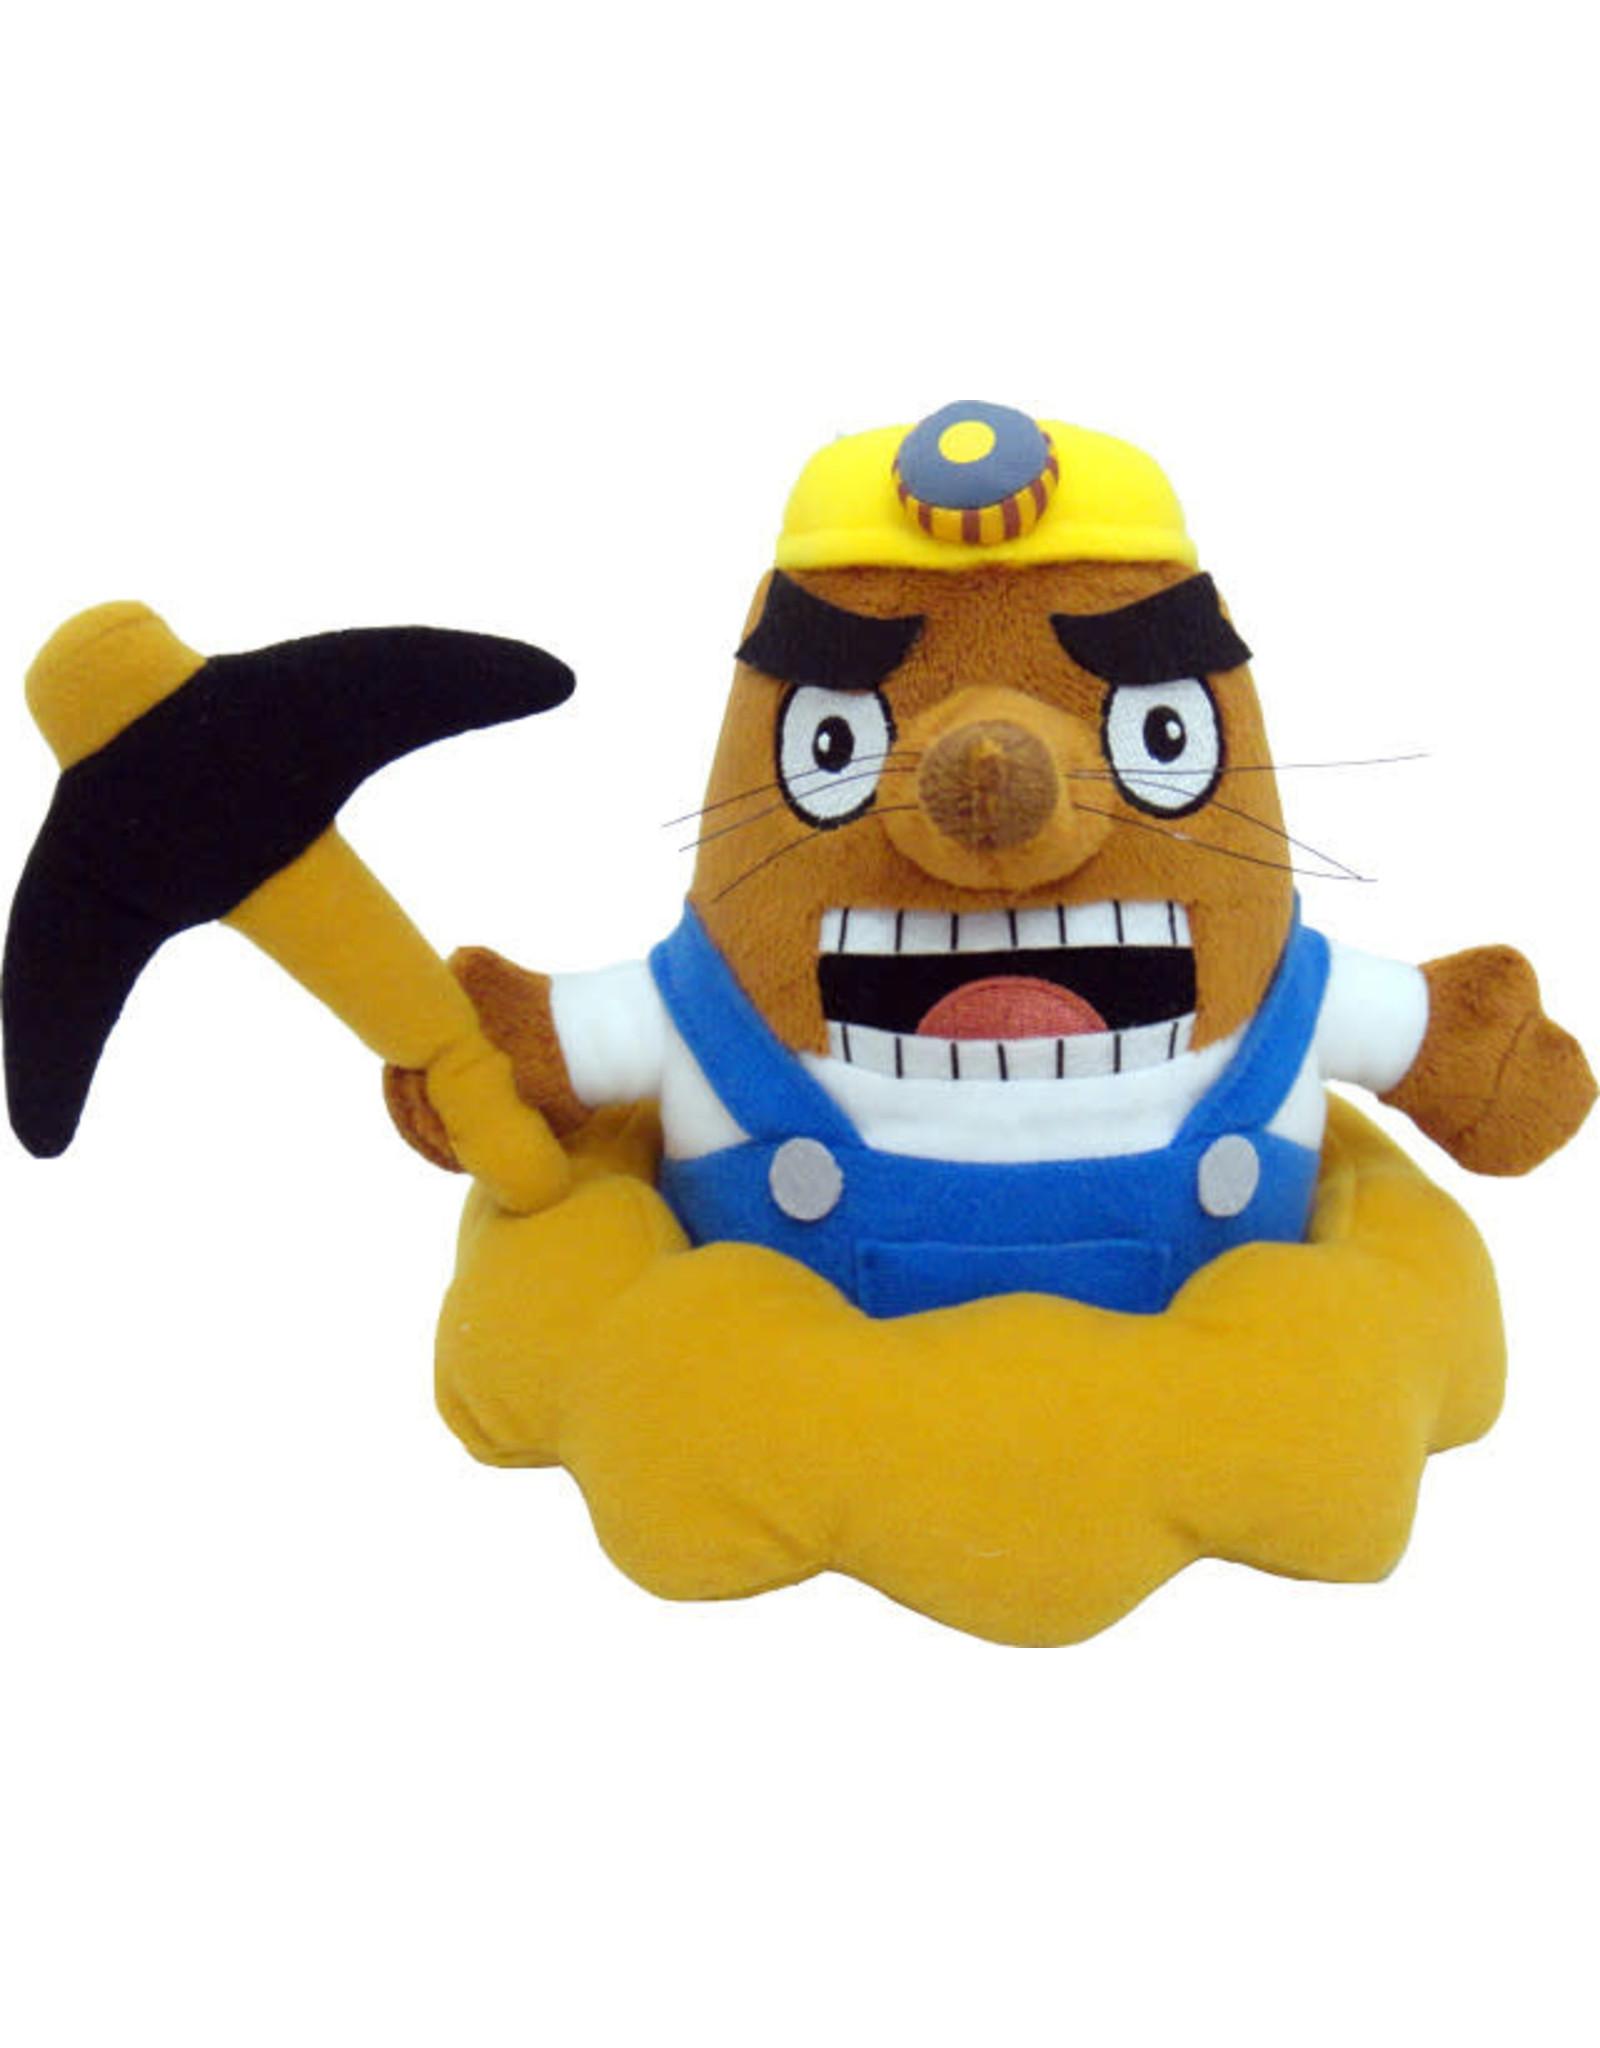 Animal Crossing Plushie - Mr. Resetti - 18cm